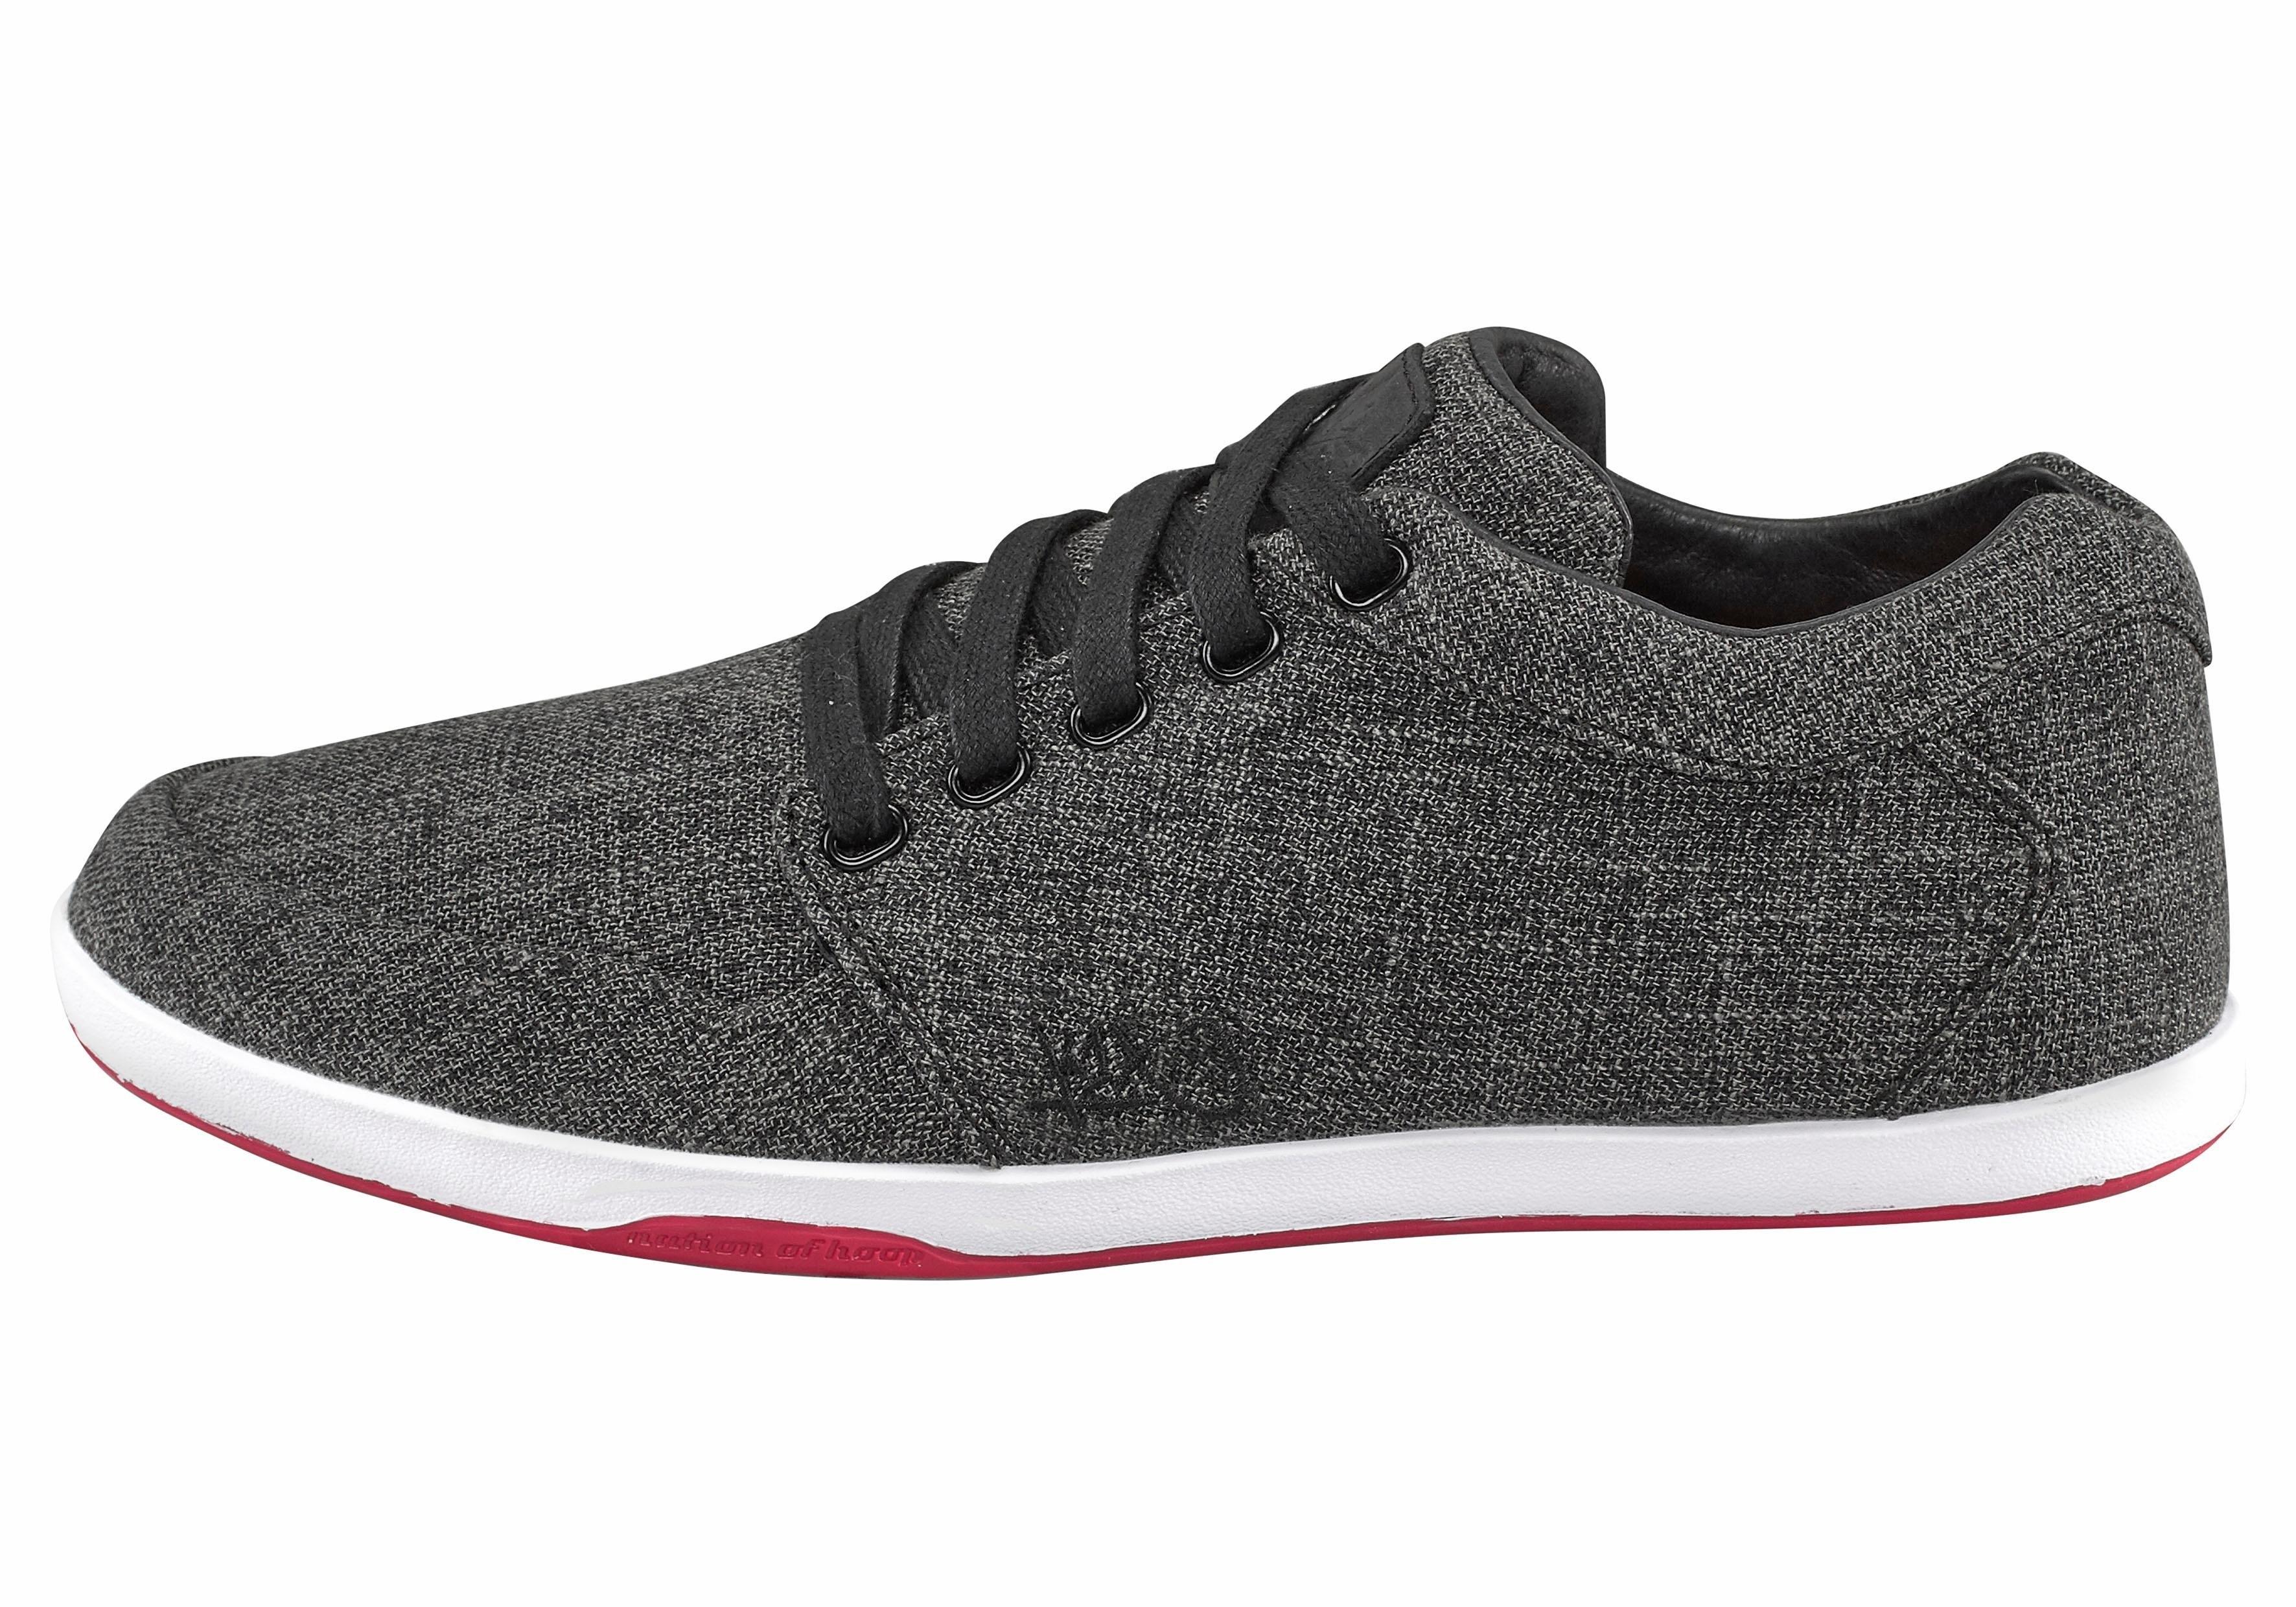 Kopen Sneakerslp Low K1x Online Nu mvN0n8w